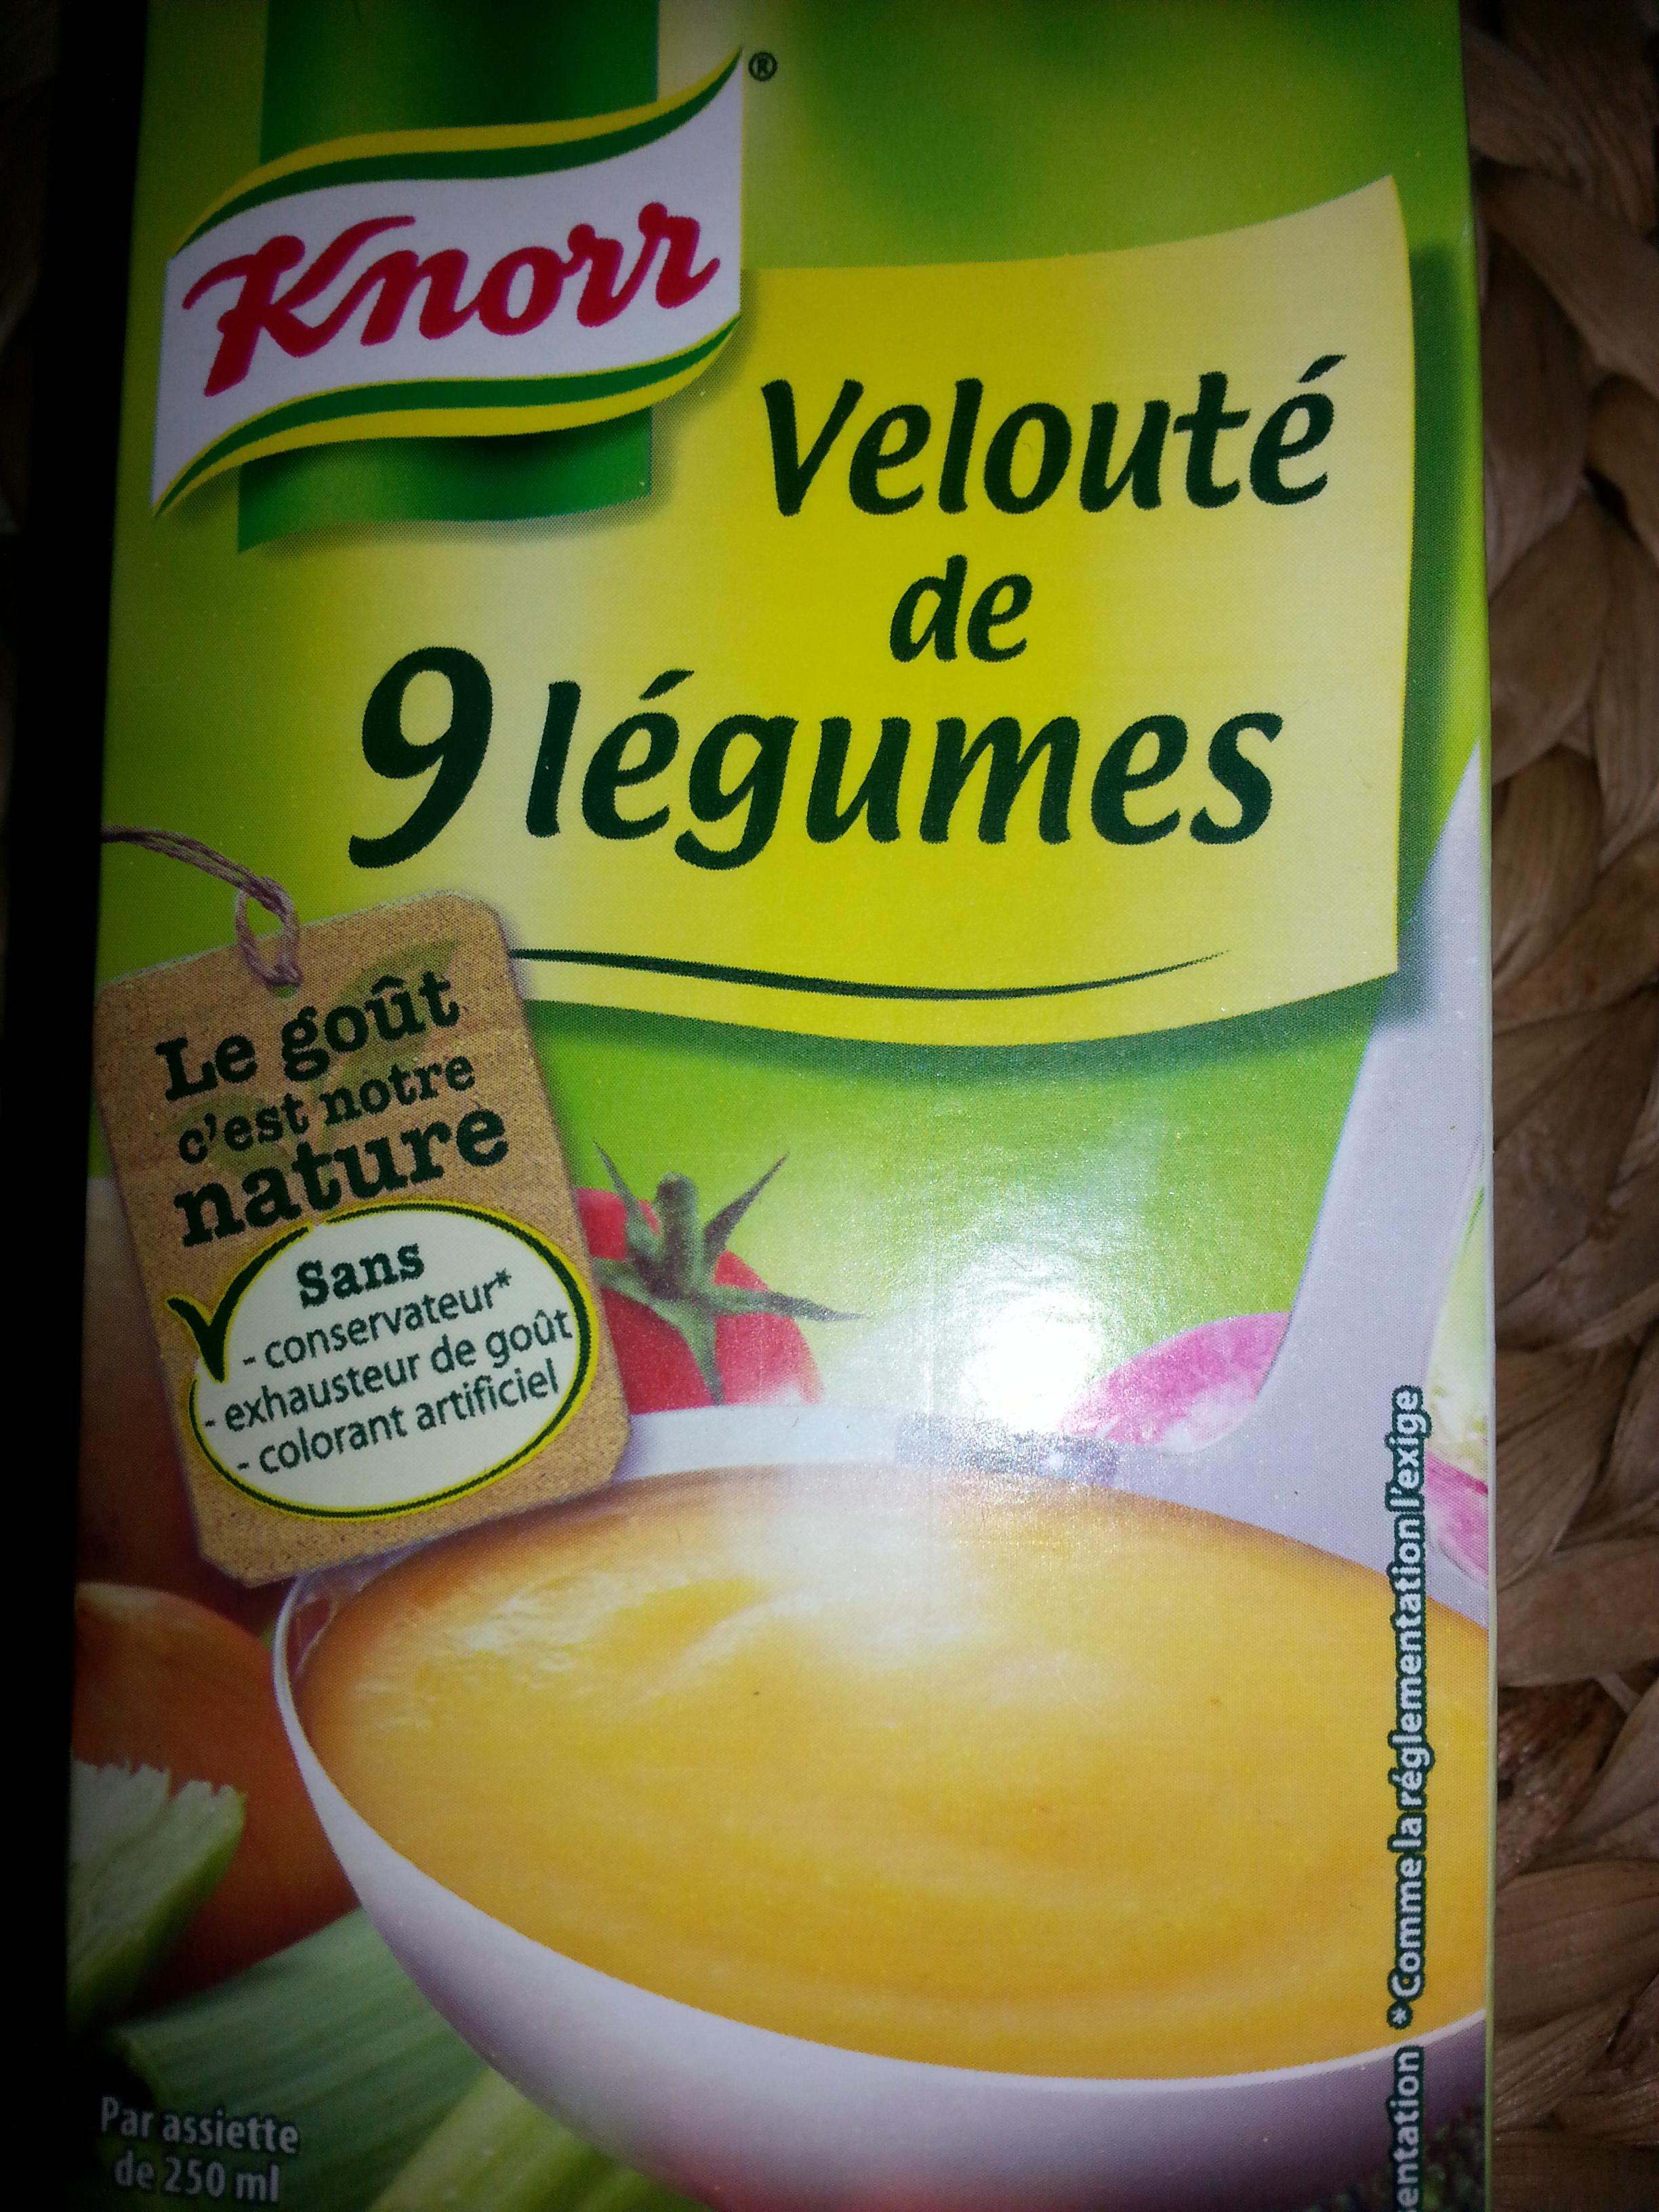 Velouté de neuf légumes - Prodotto - fr